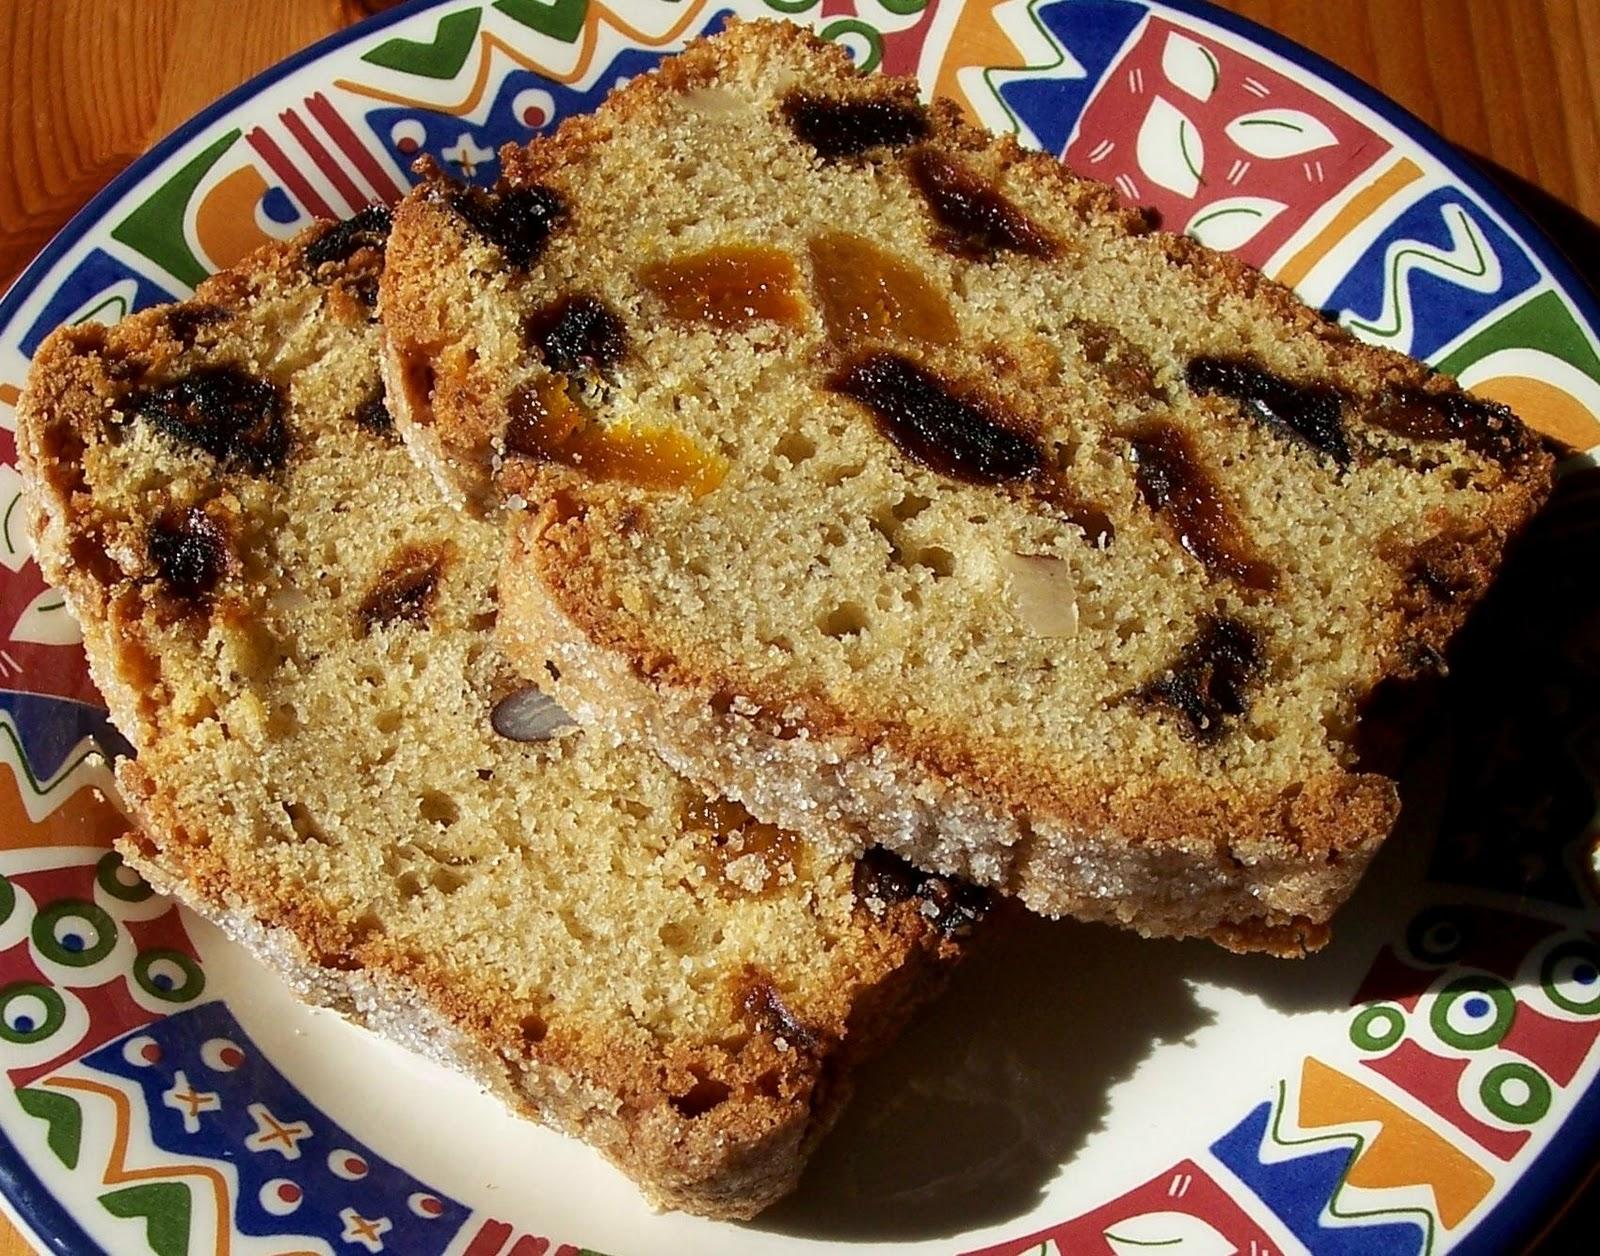 Date & Brazil Nut Cake